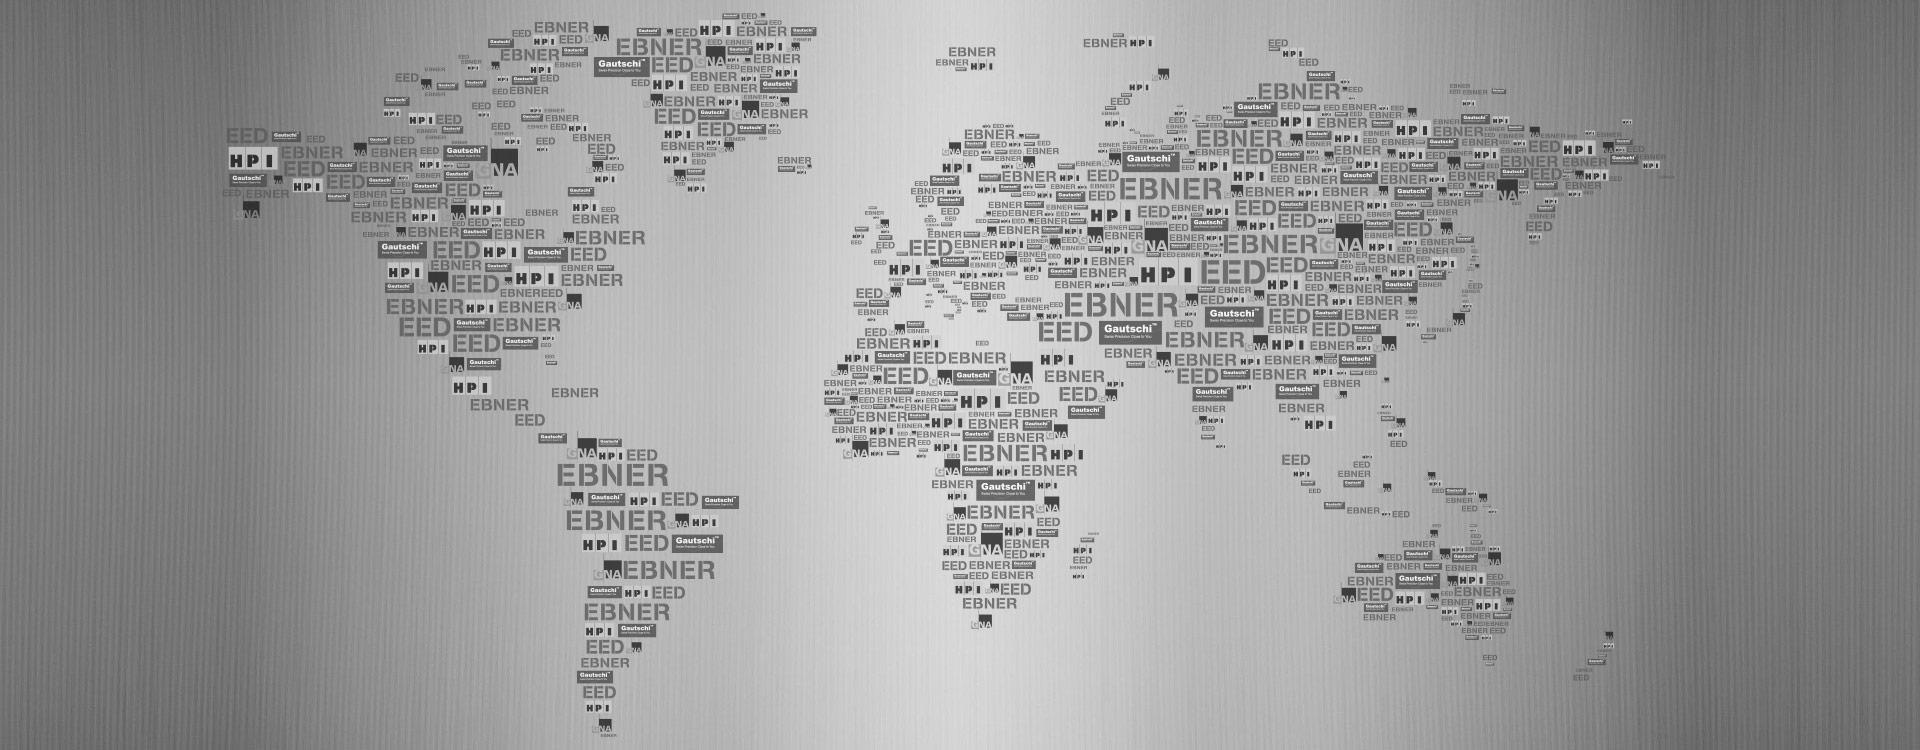 World map - EBNER Group